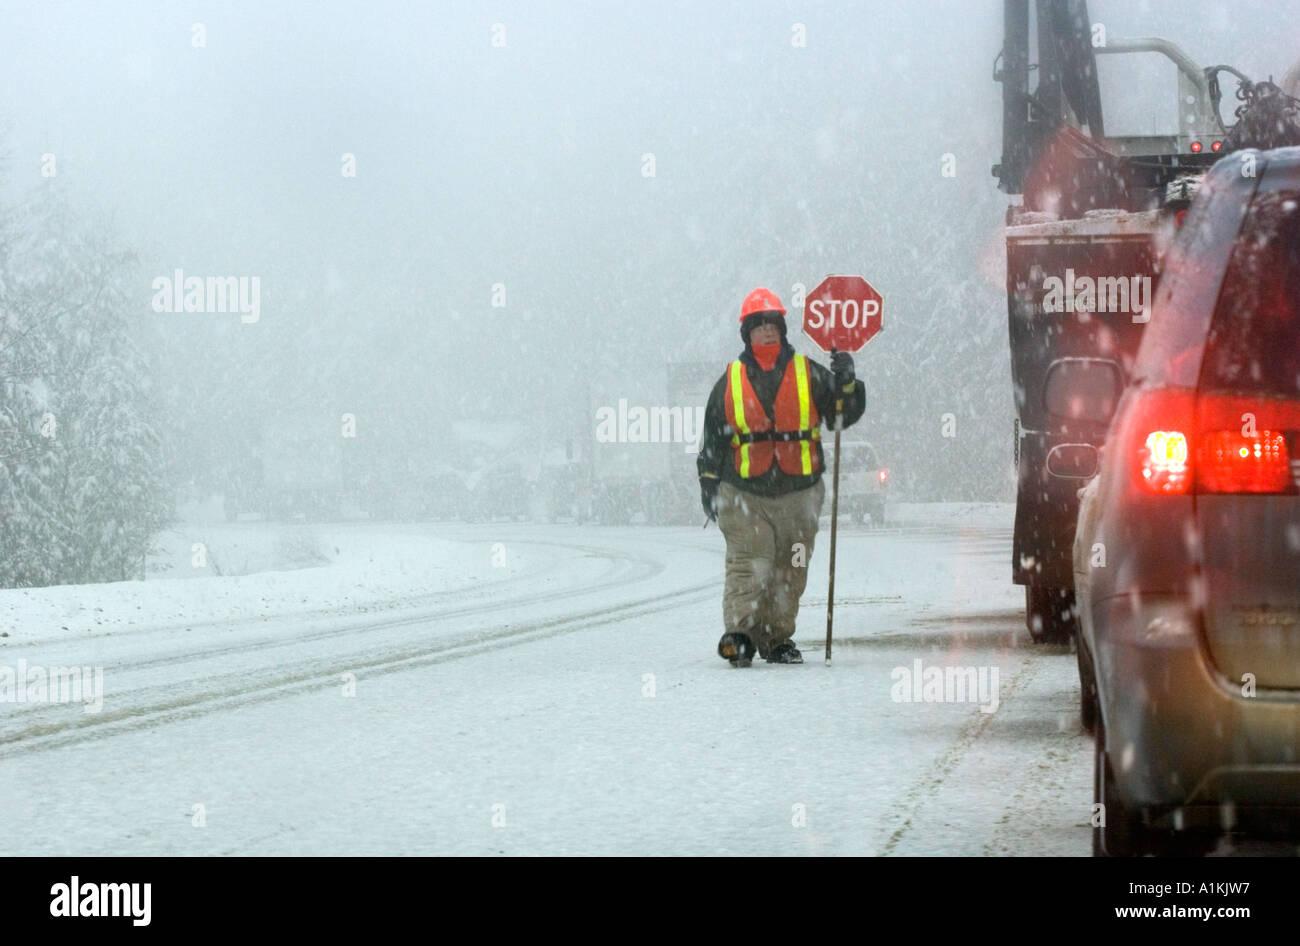 flagman walking past traffic jam during avalanche control - Stock Image